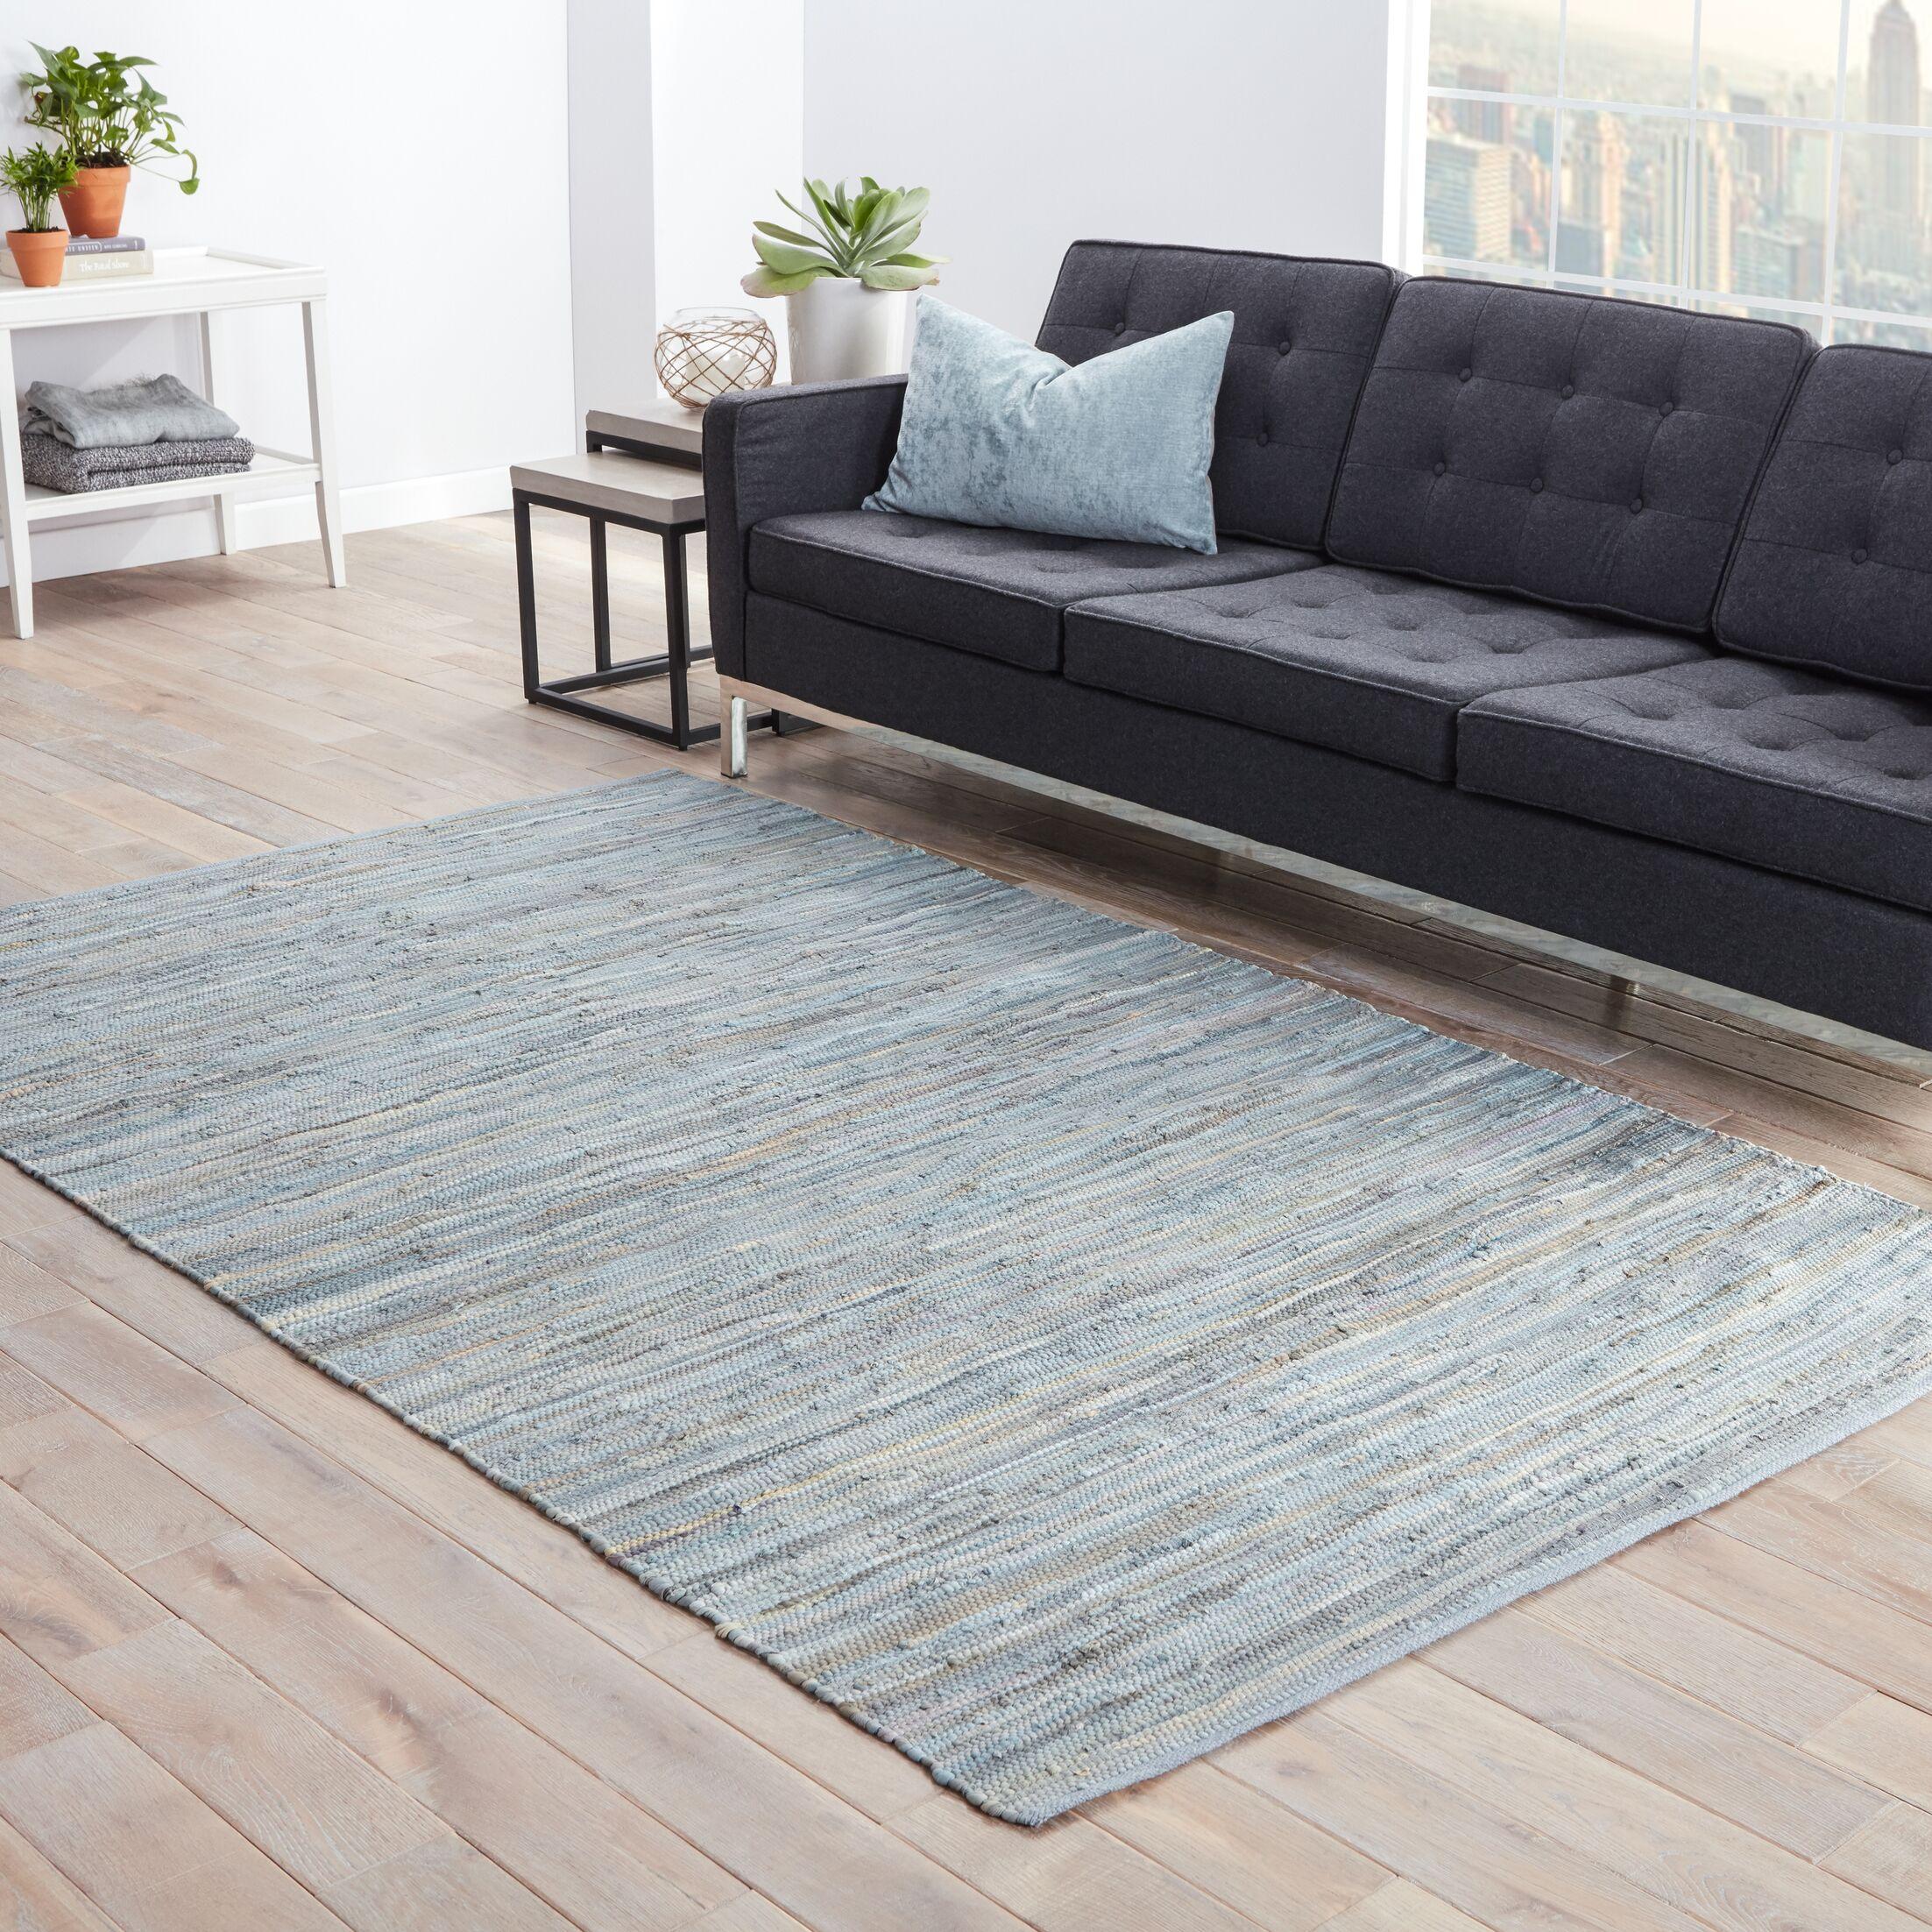 Cummins Cotton Solids/Handloom Blue Area Rug Rug Size: Rectangle 5' x 8'